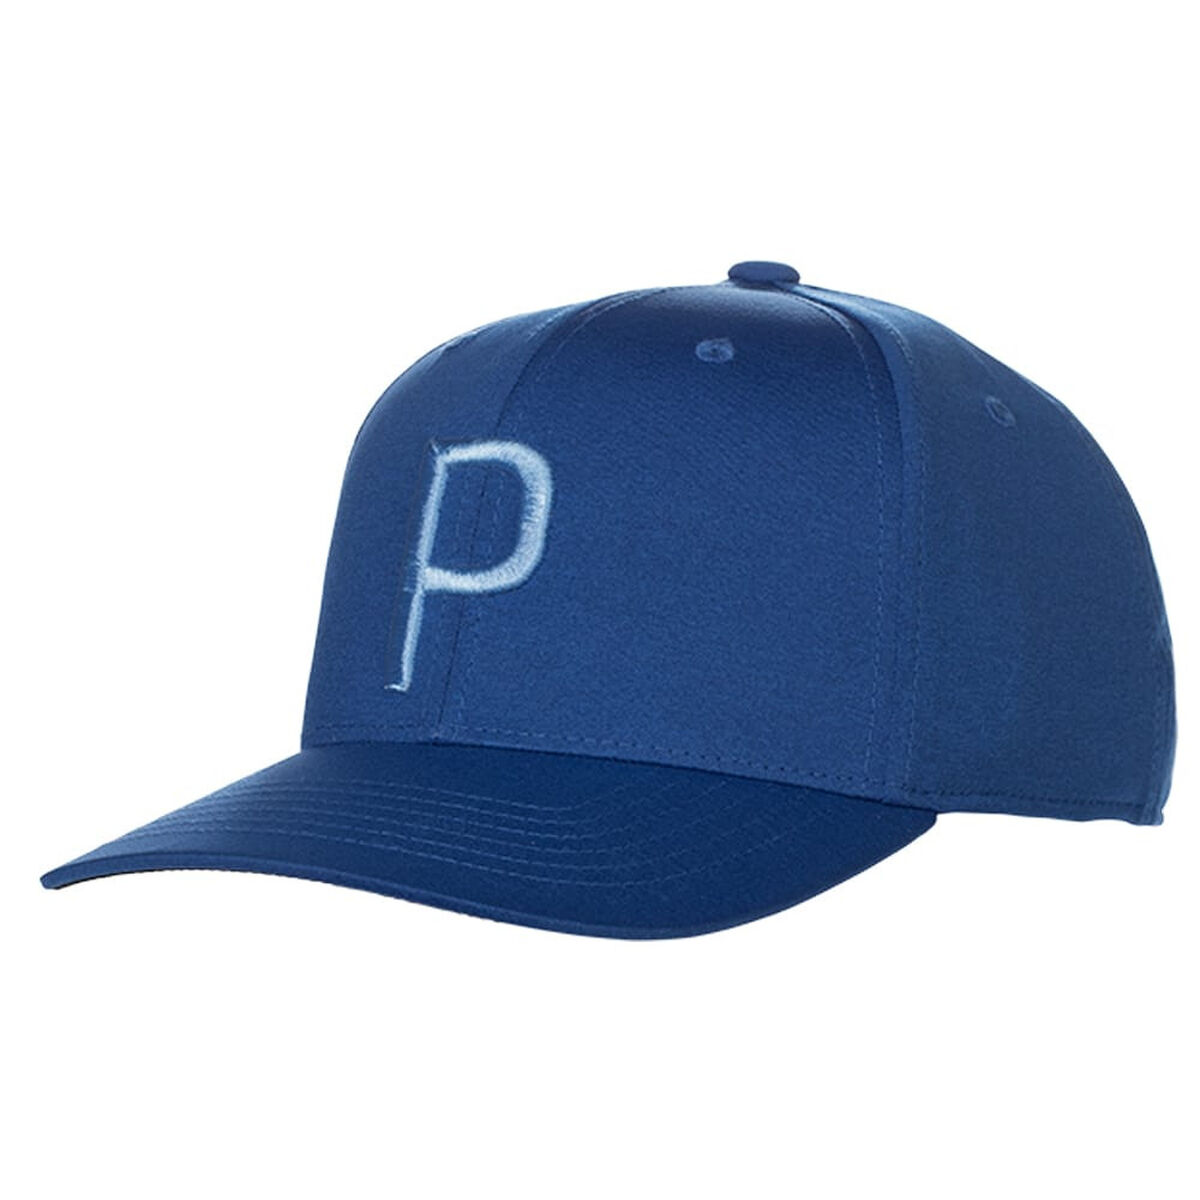 713b8cd8 PUMA P 110 Snapback Hat | PGA TOUR Superstore